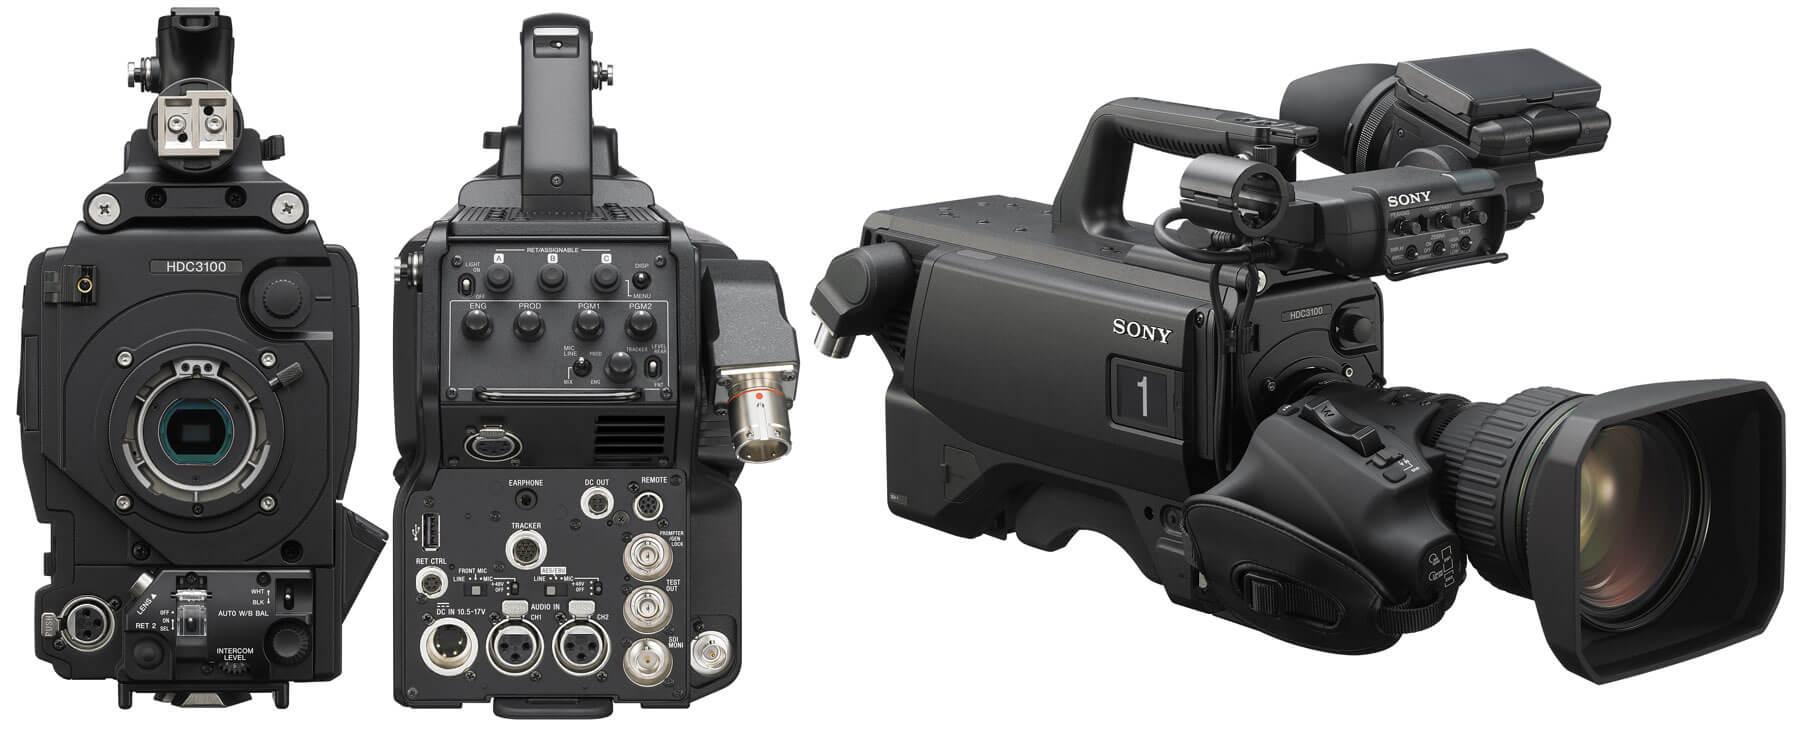 HDC3100